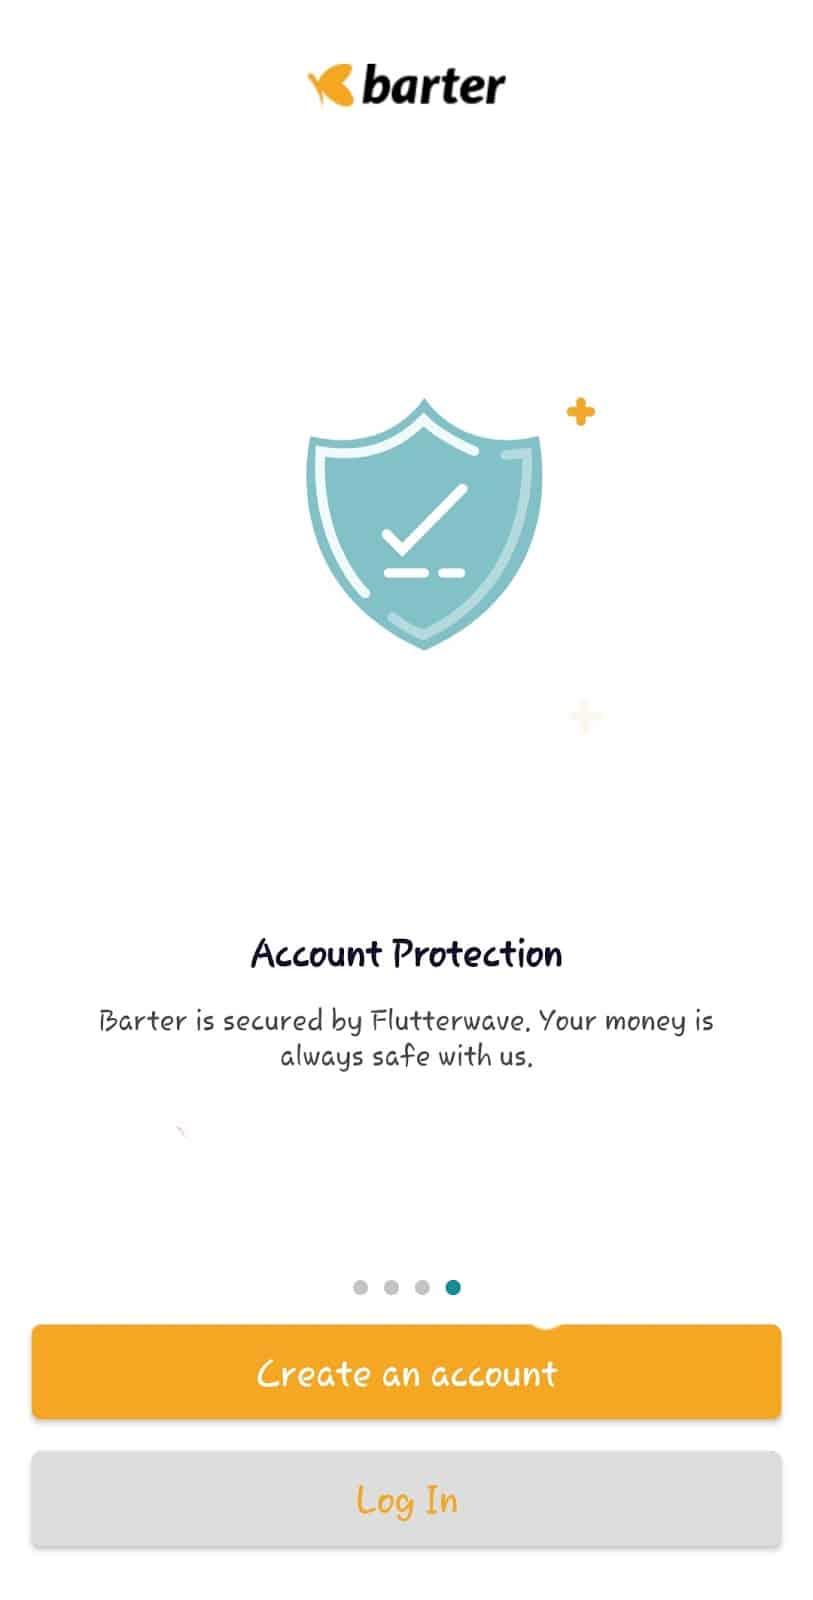 barter homepage for barter virtual dollar card